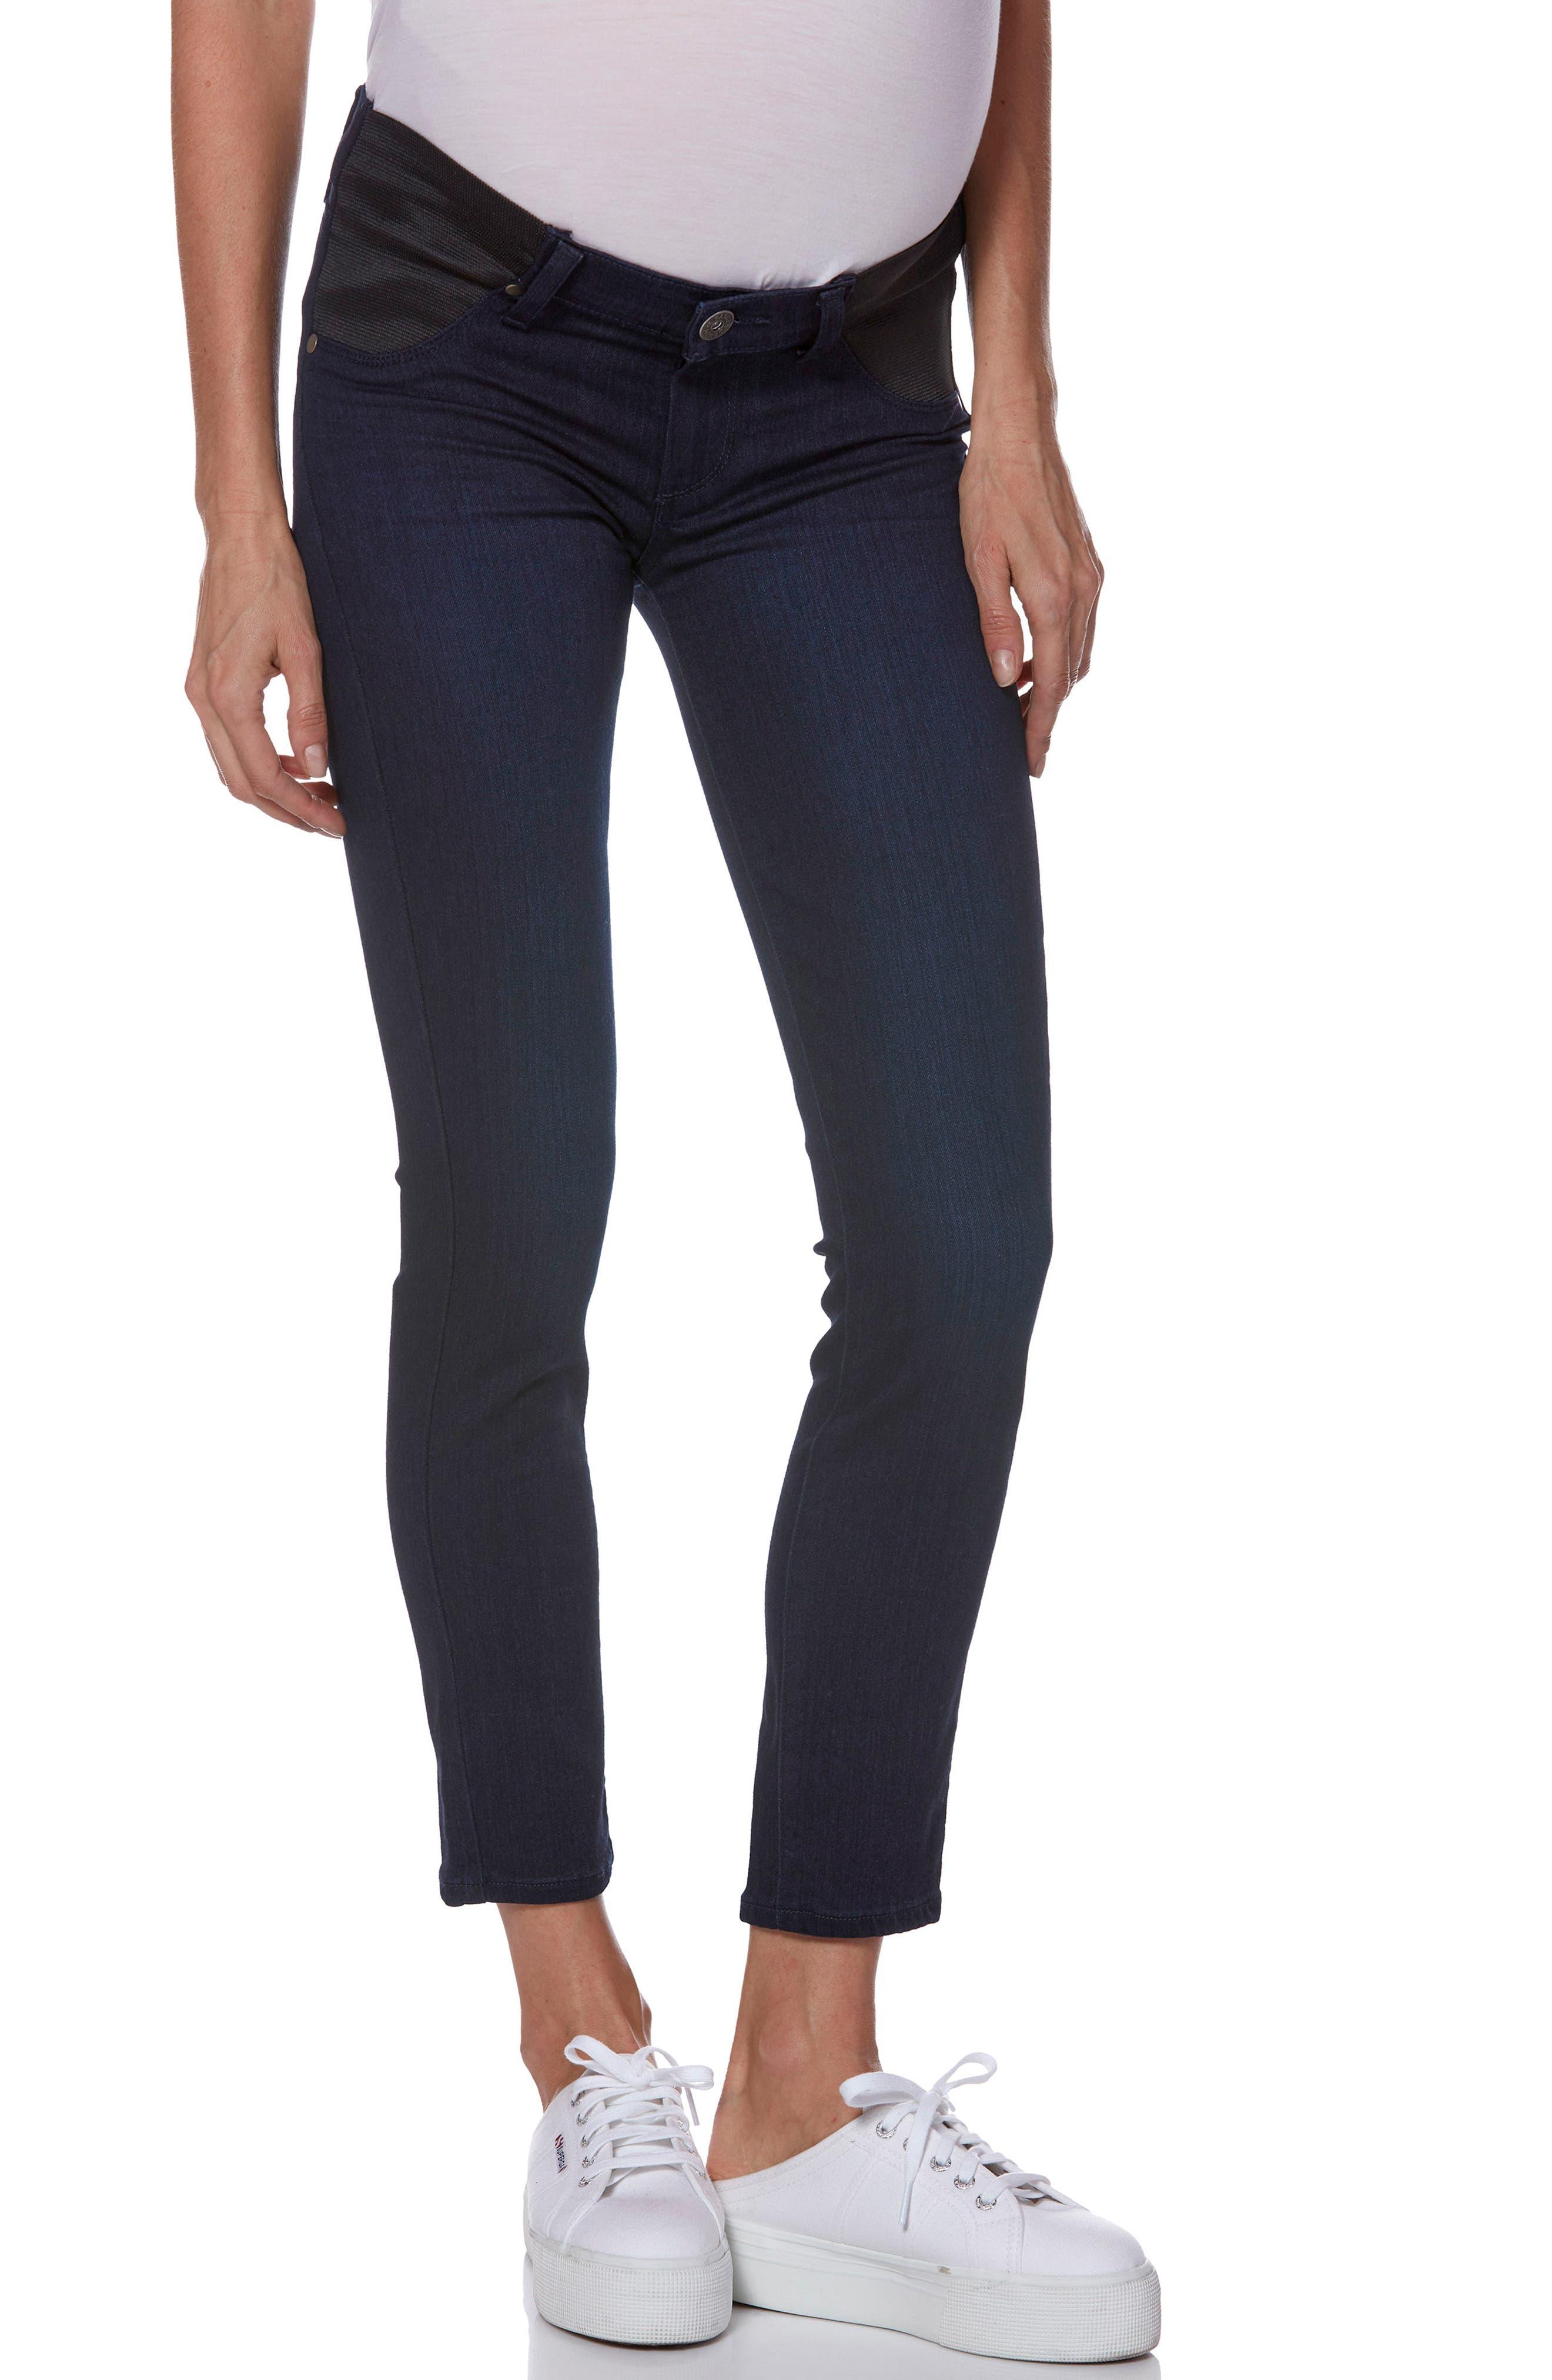 PAIGE Transcend - Verdugo Ultra Skinny Maternity Jeans, Main, color, LANA